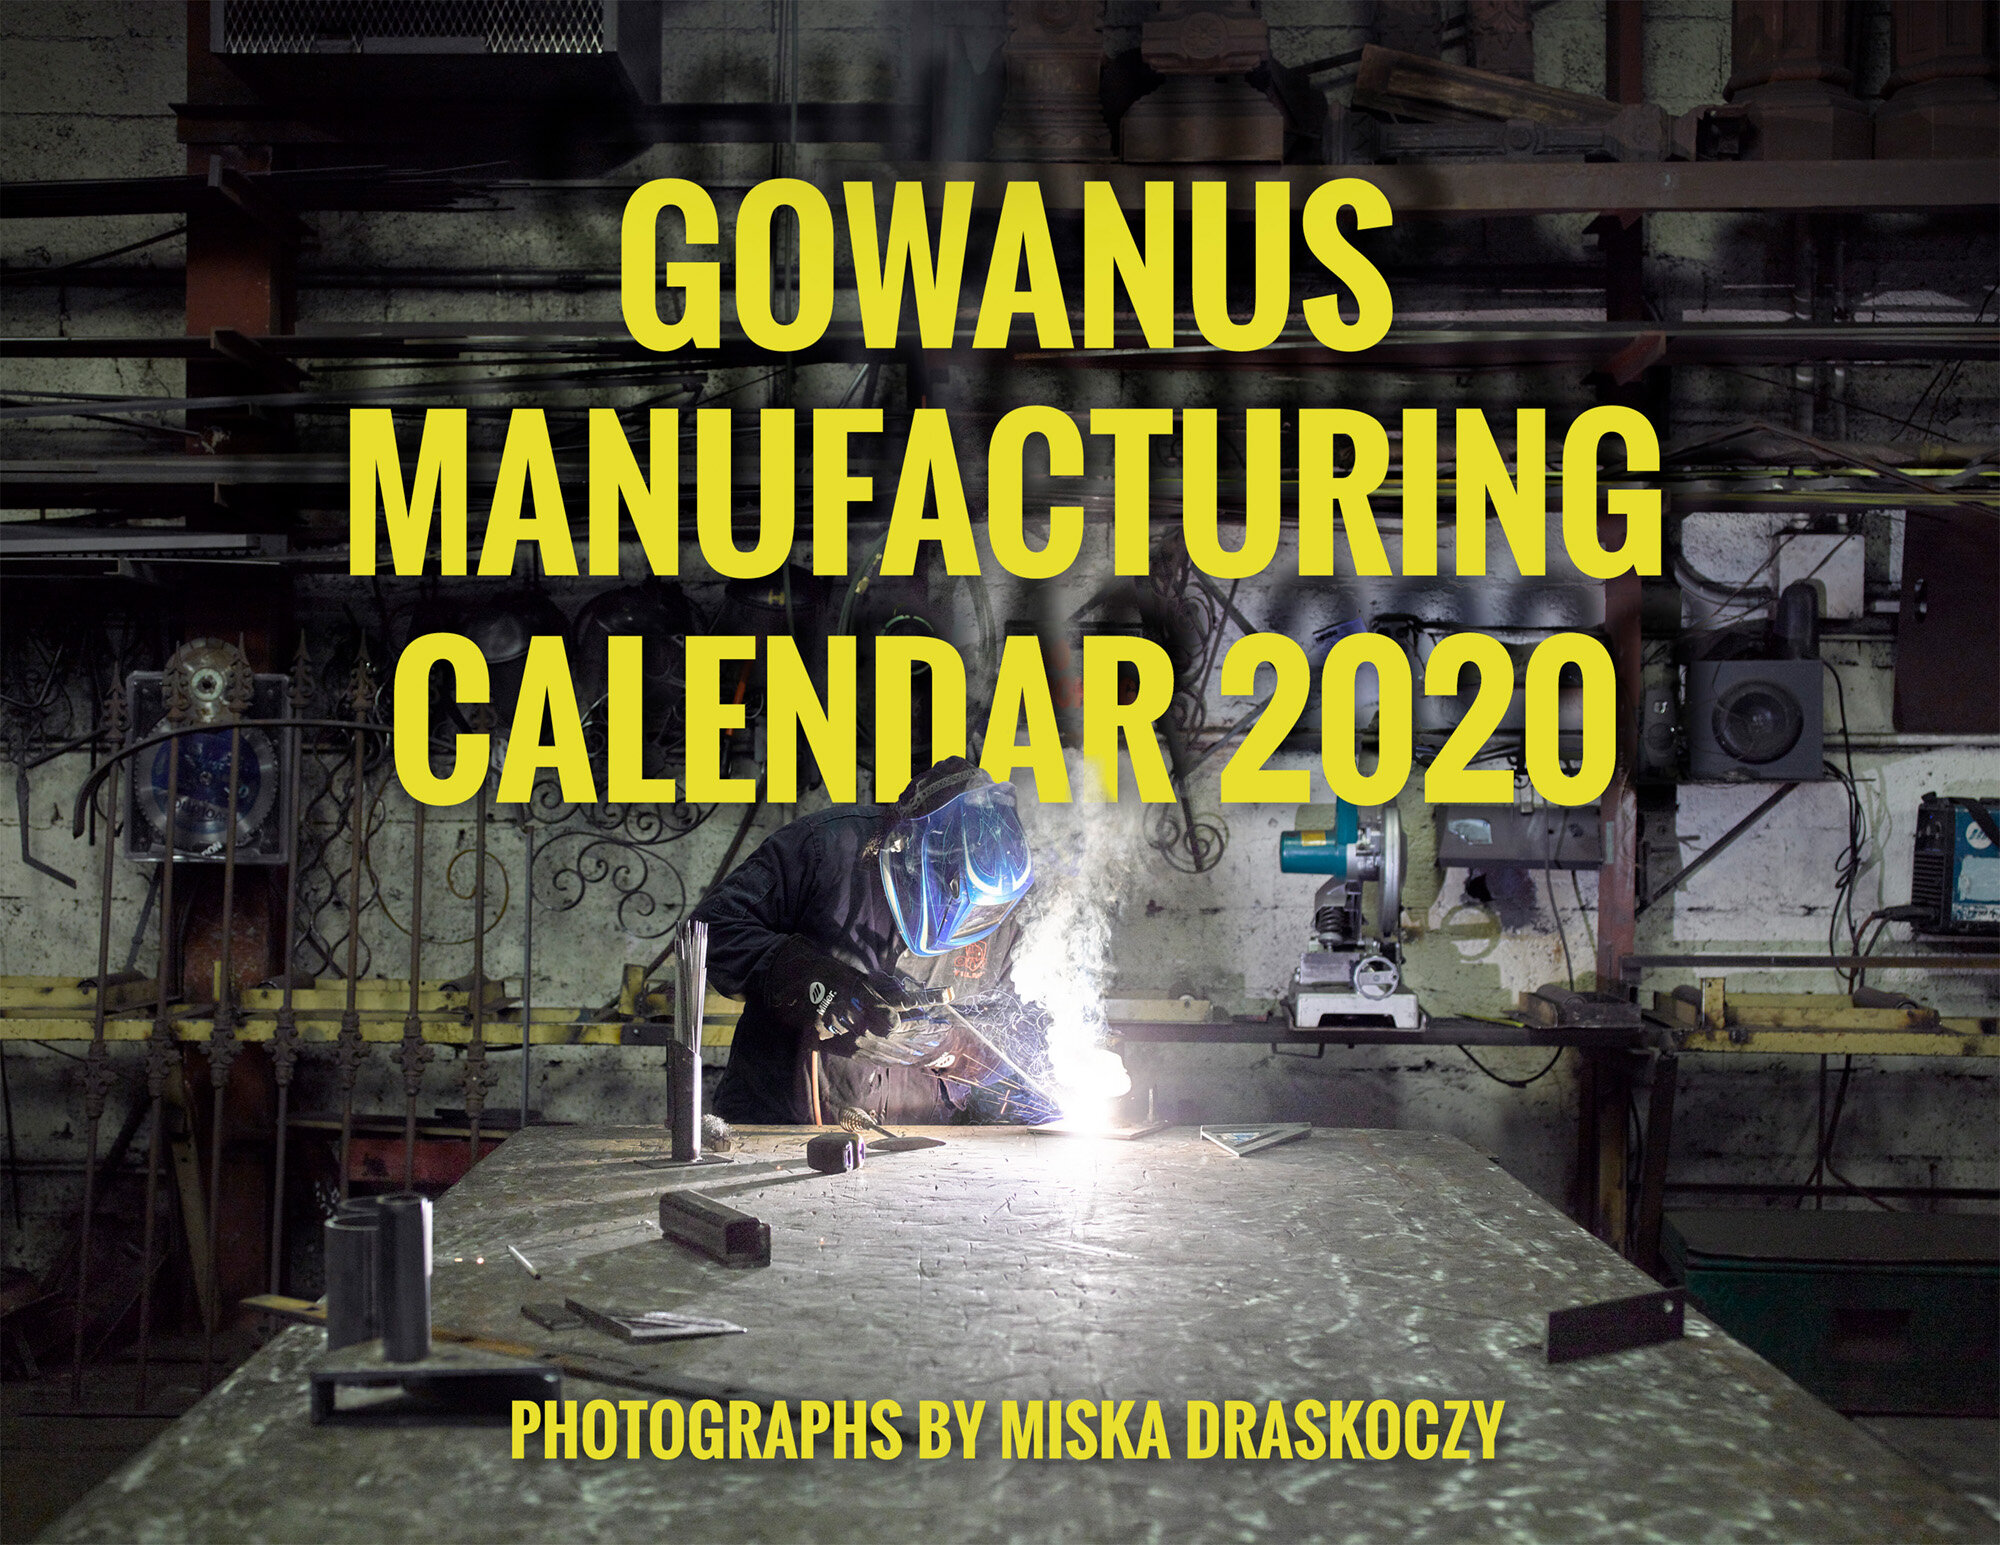 Gowanus_Calendar_cover_w-3d_shadow_2000.jpg